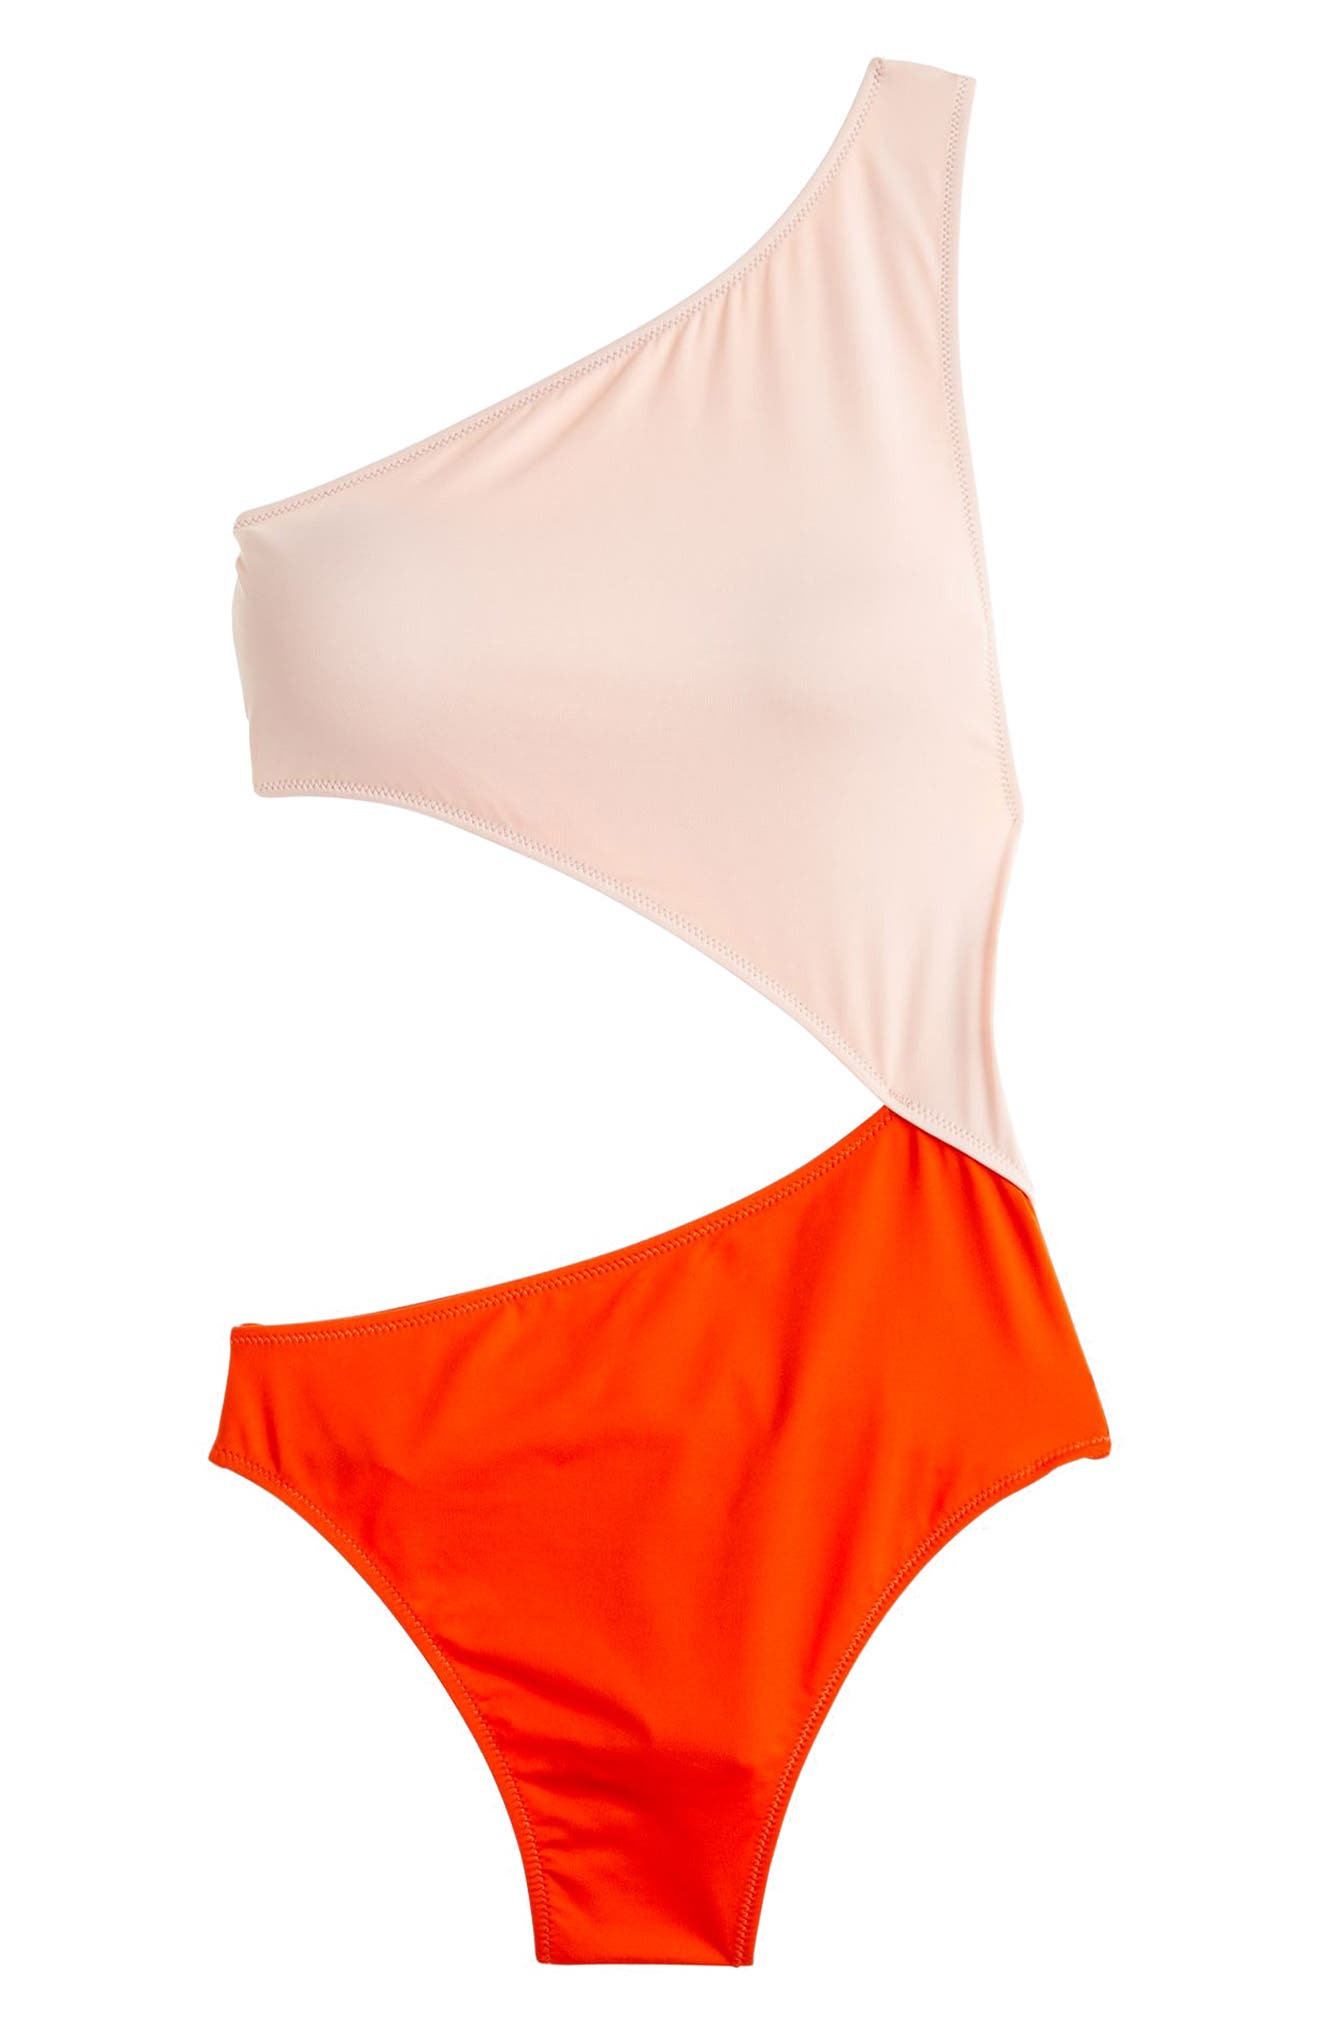 Playa Tilden Colorblock One-Piece Swimsuit,                             Alternate thumbnail 3, color,                             801